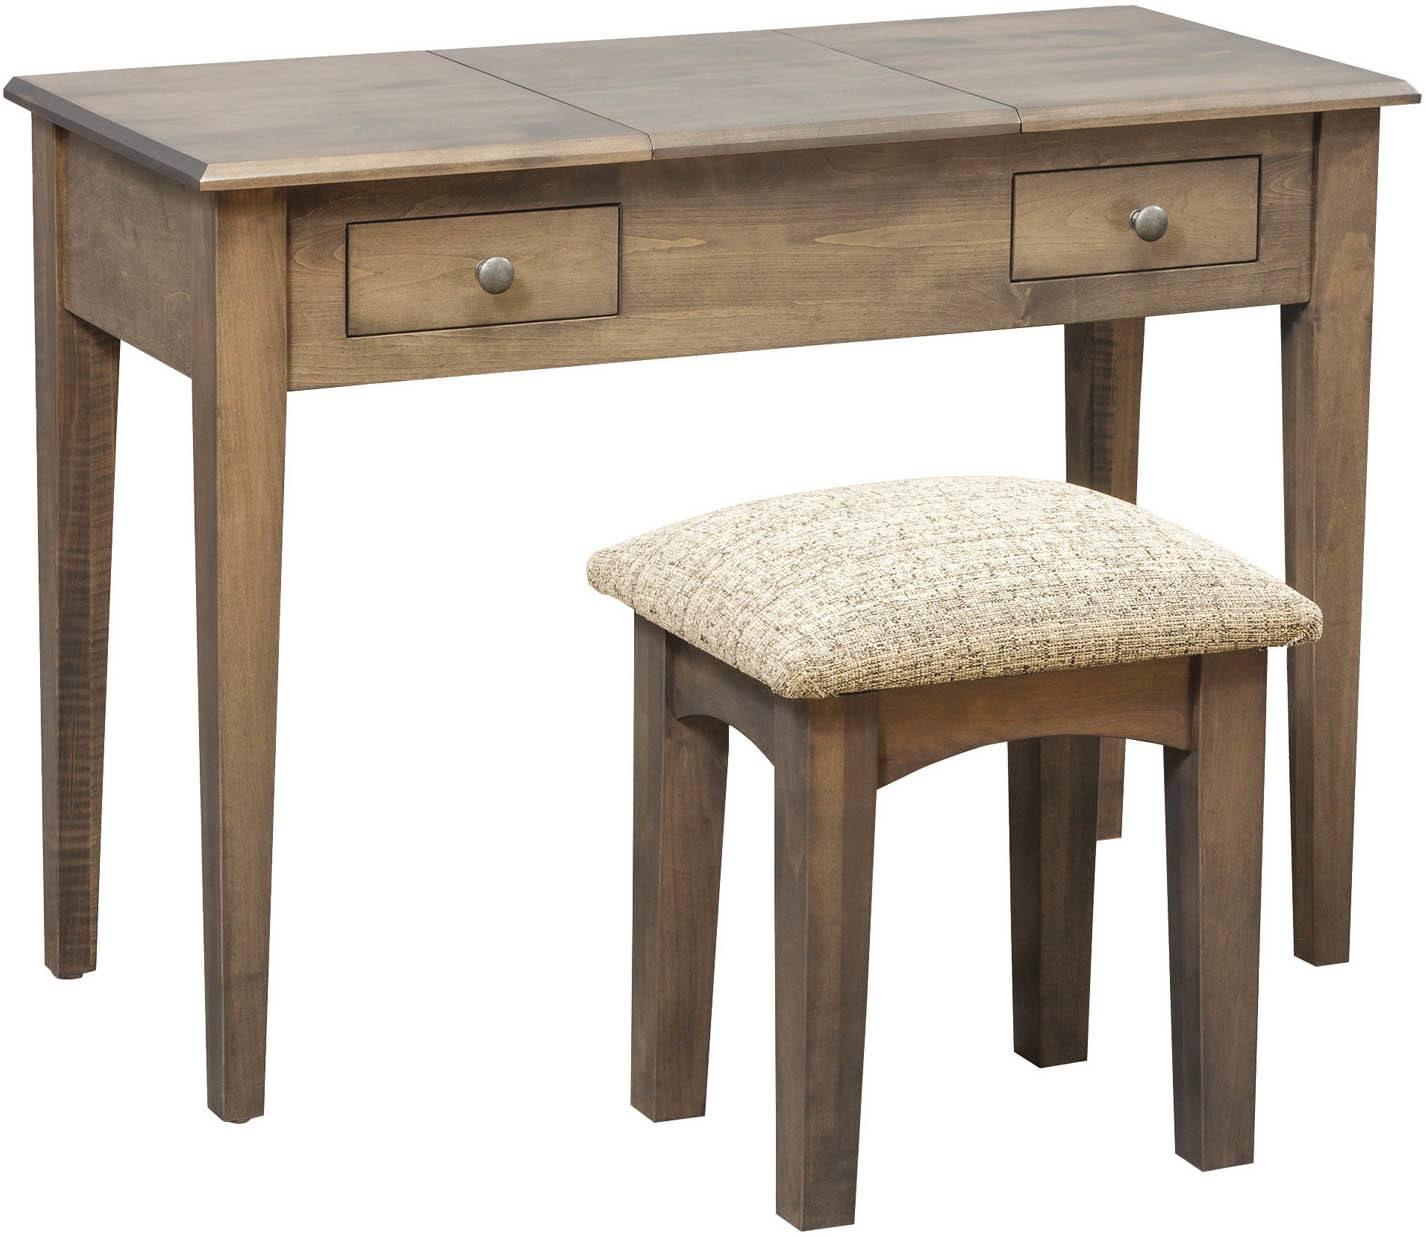 42 inch Shaker Vanity Dressing Table